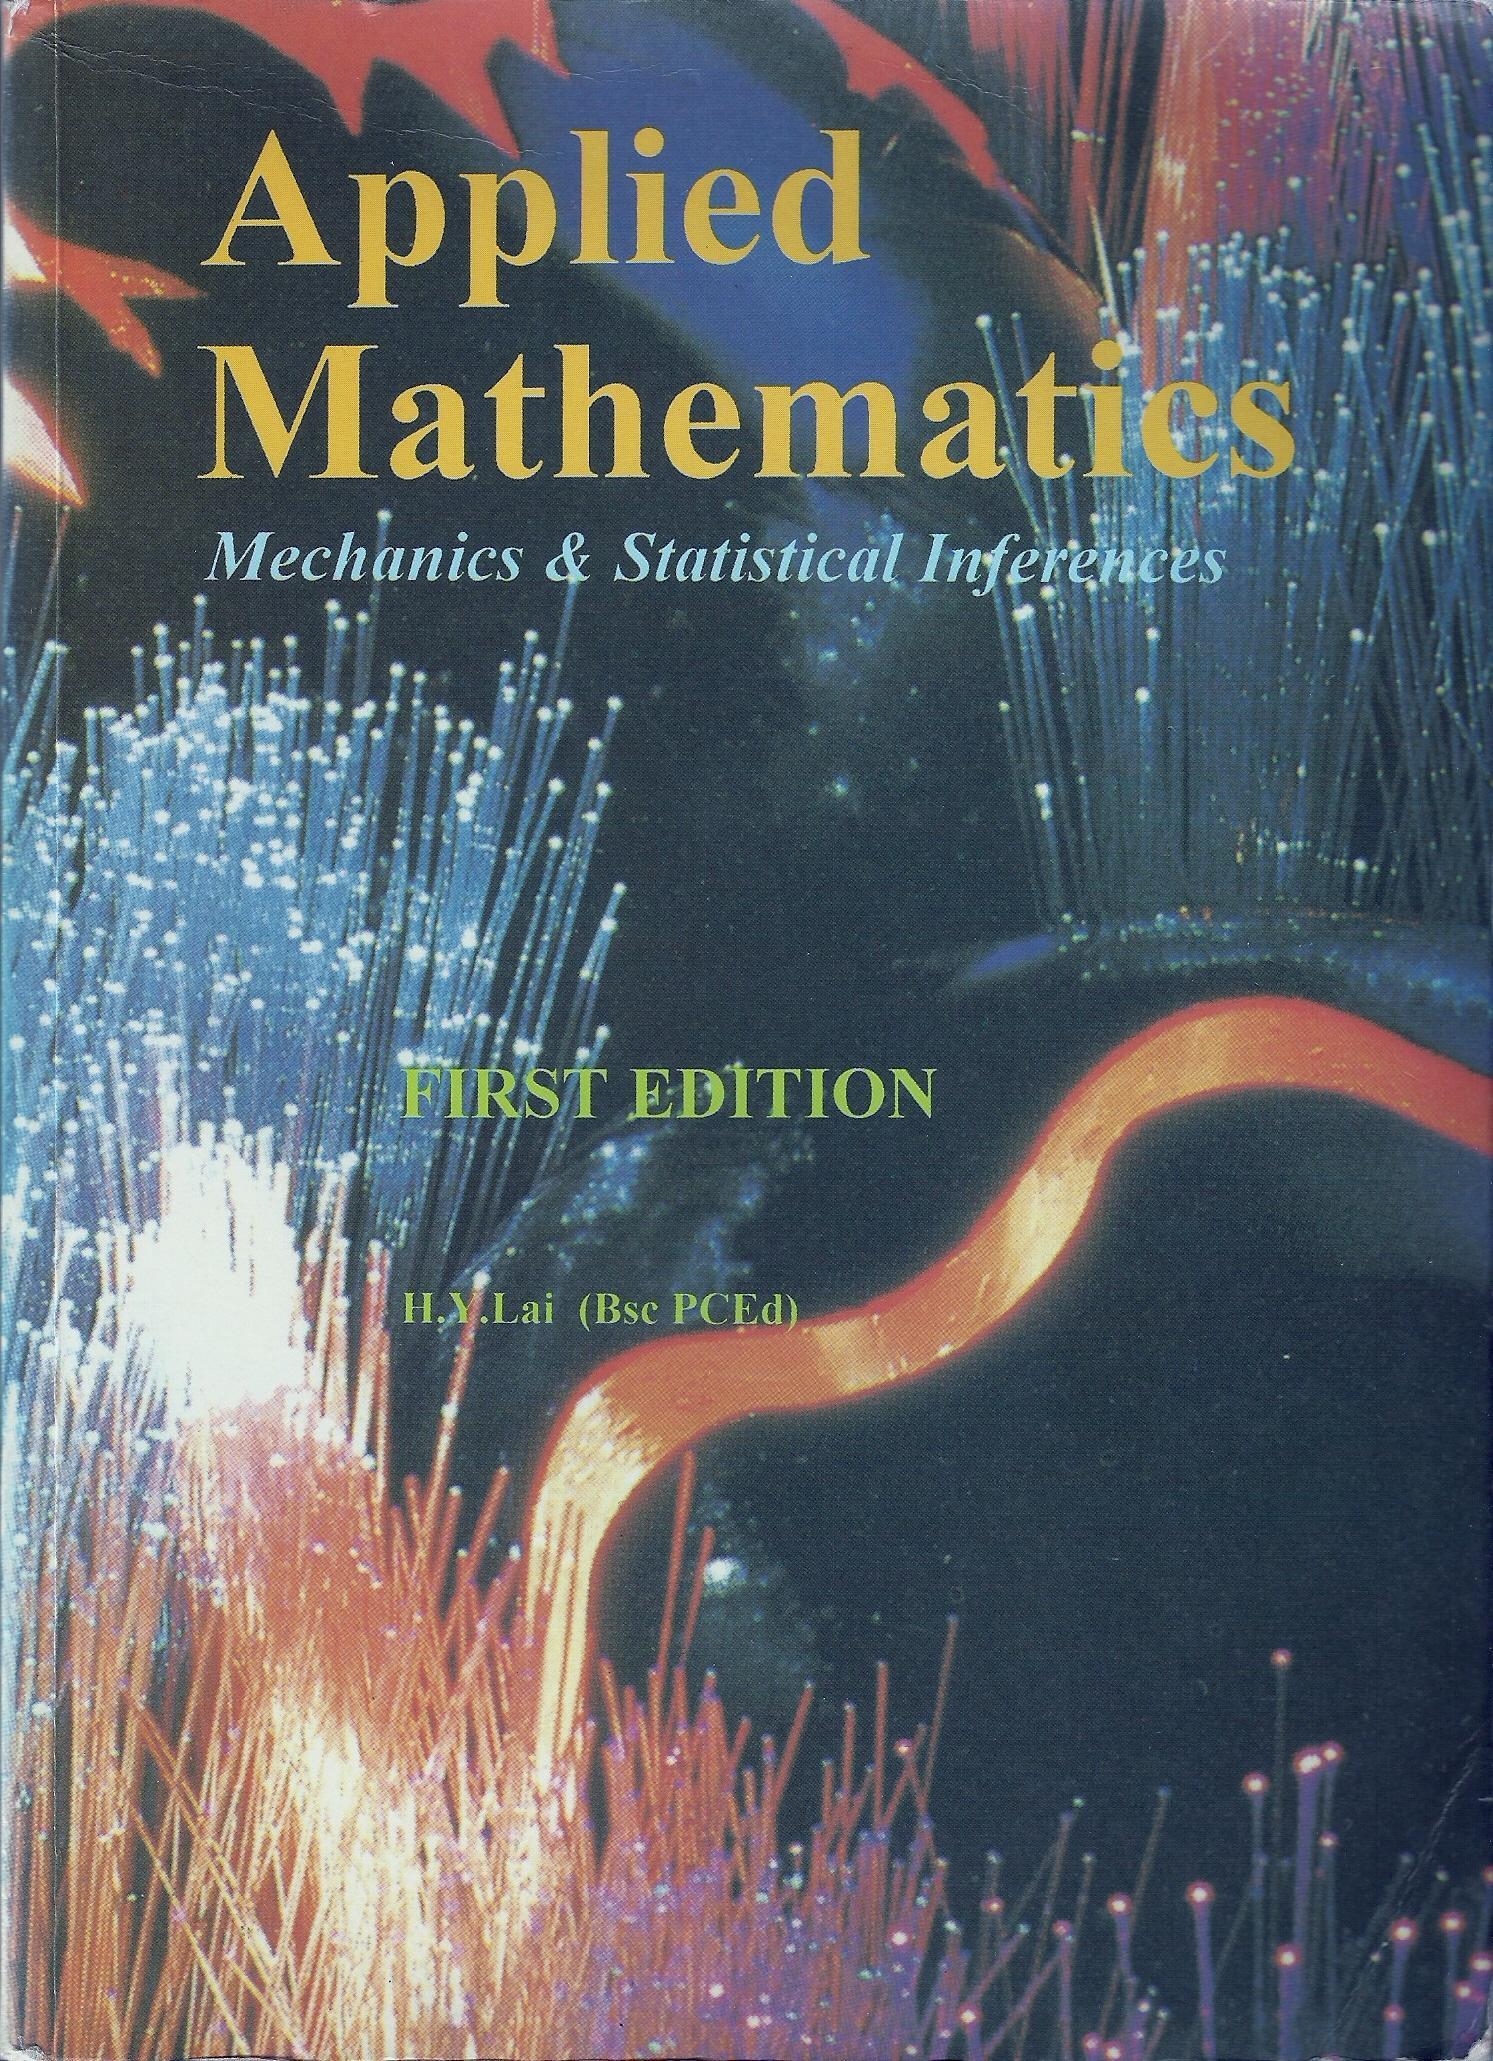 Applied Mathematics: Mechanics & Statistical Inferences